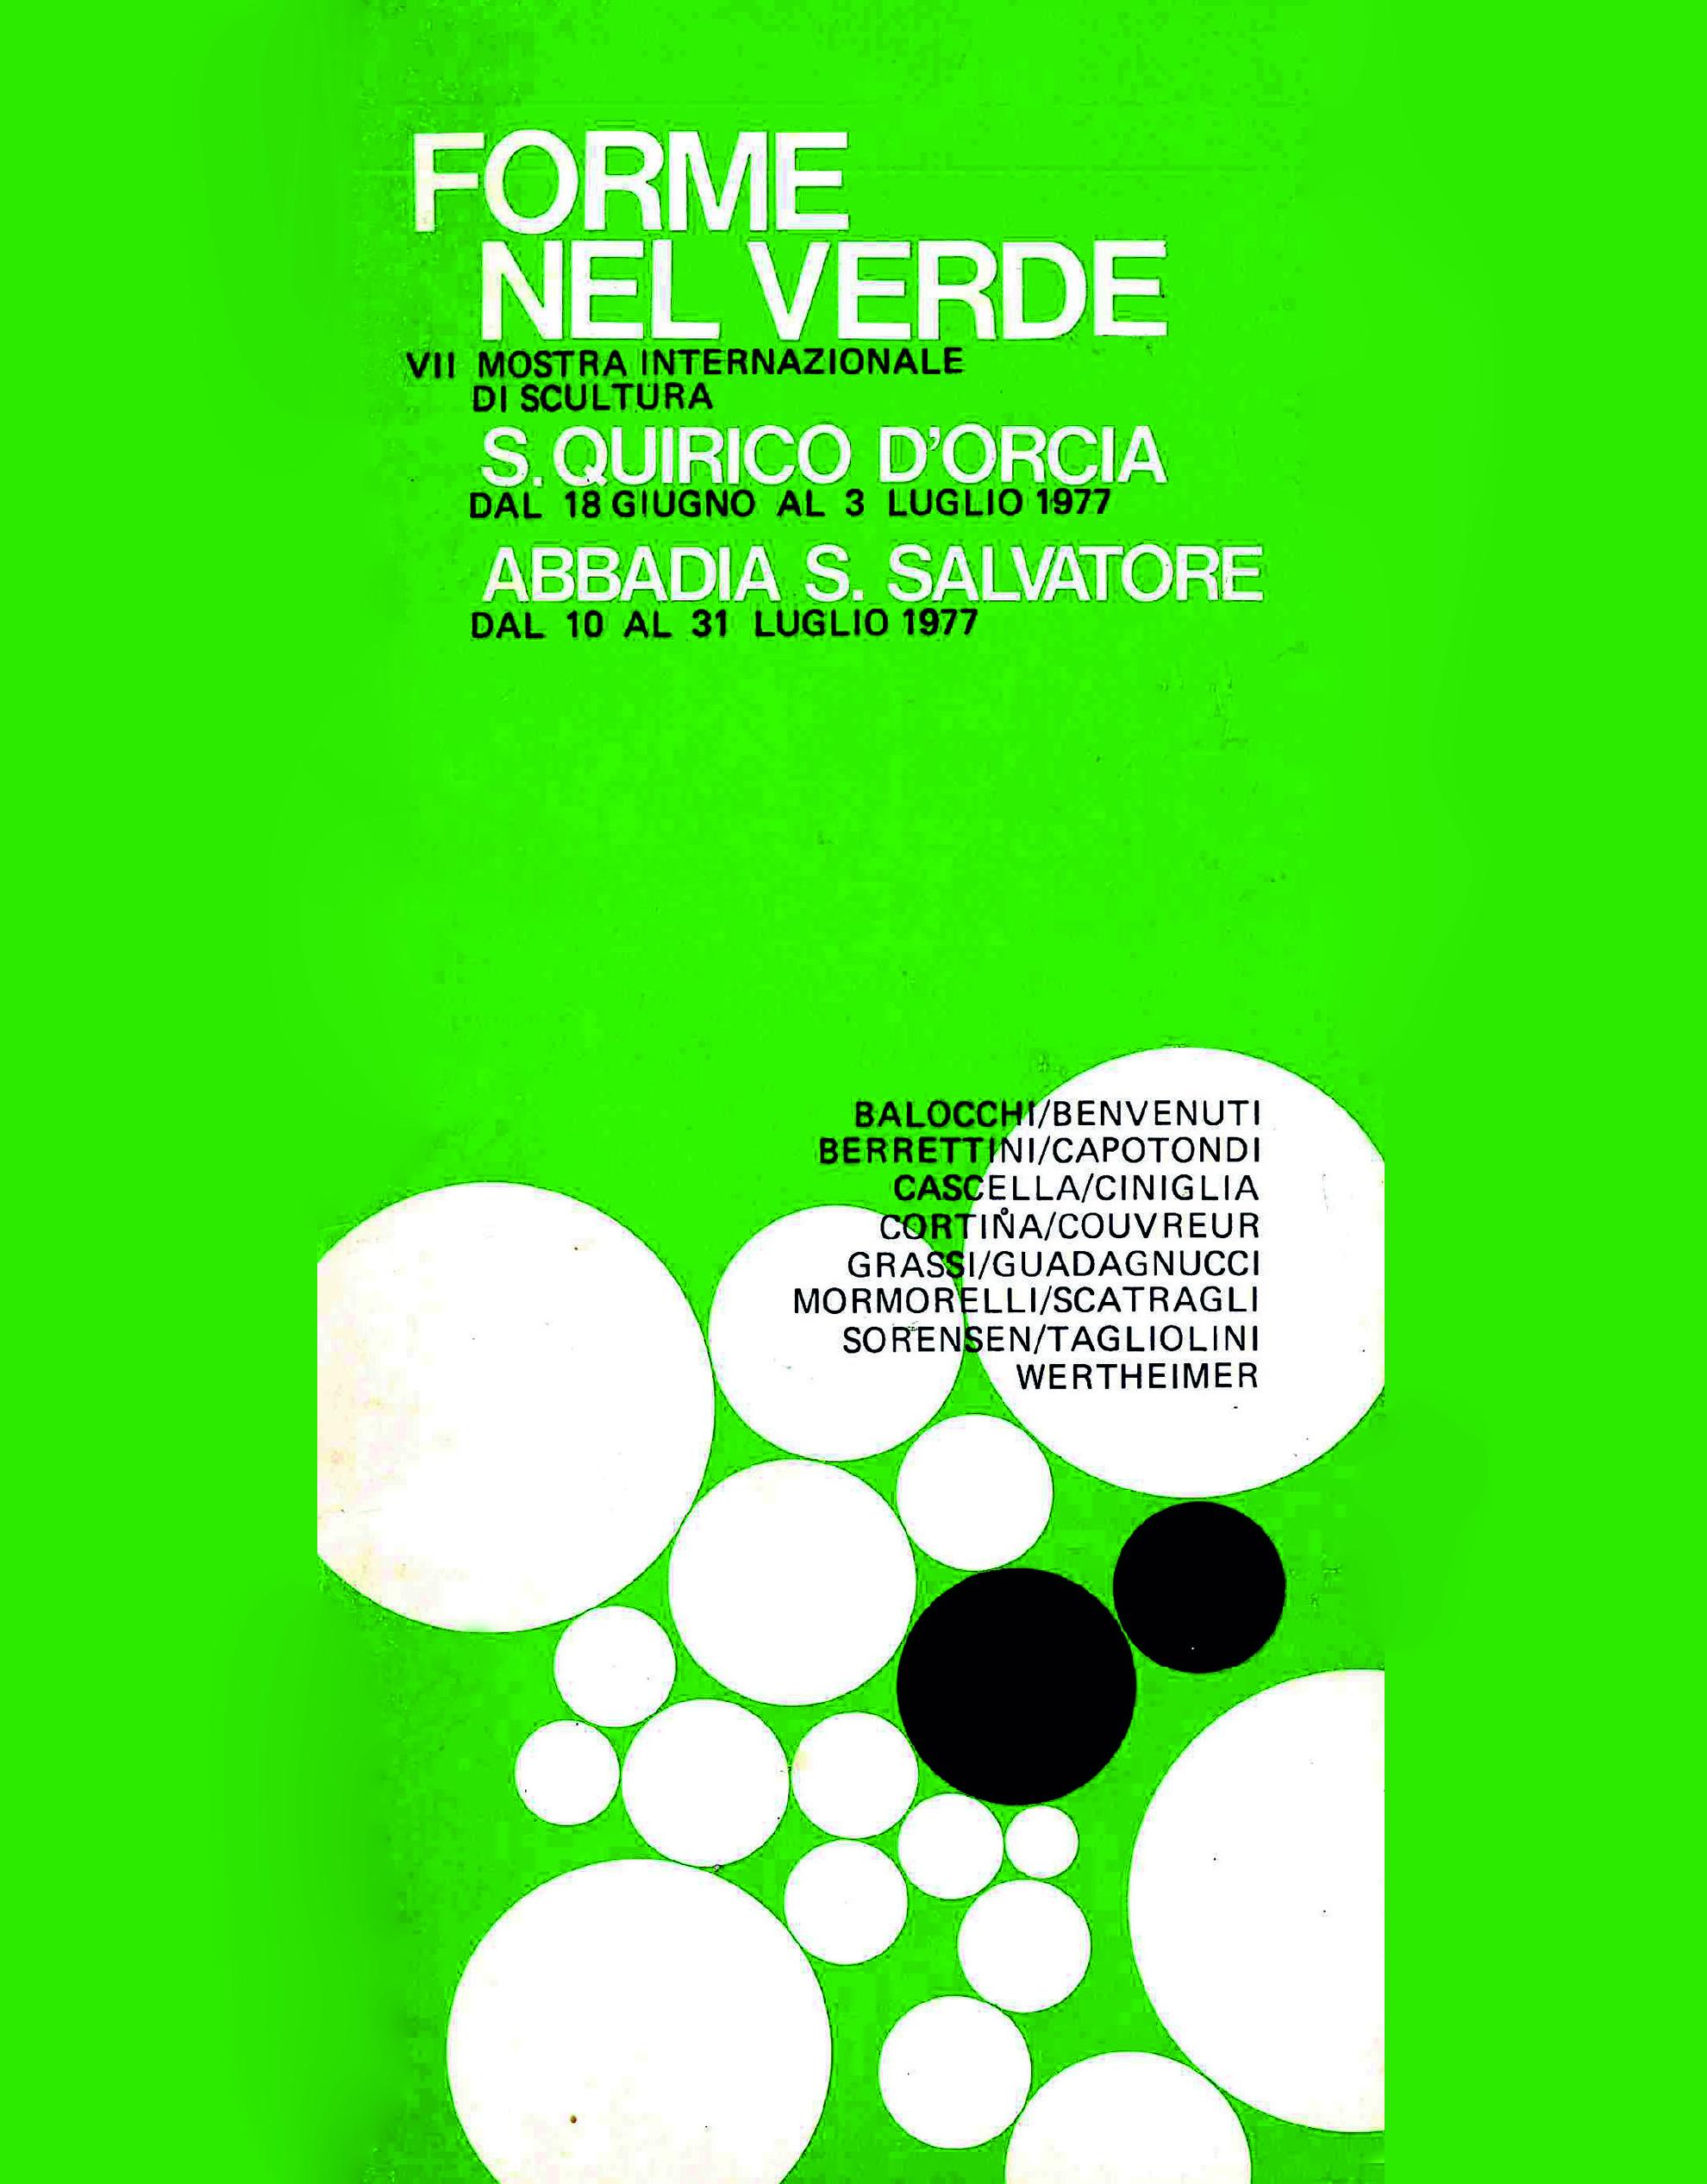 Catalogo Forme nel Verde 1977